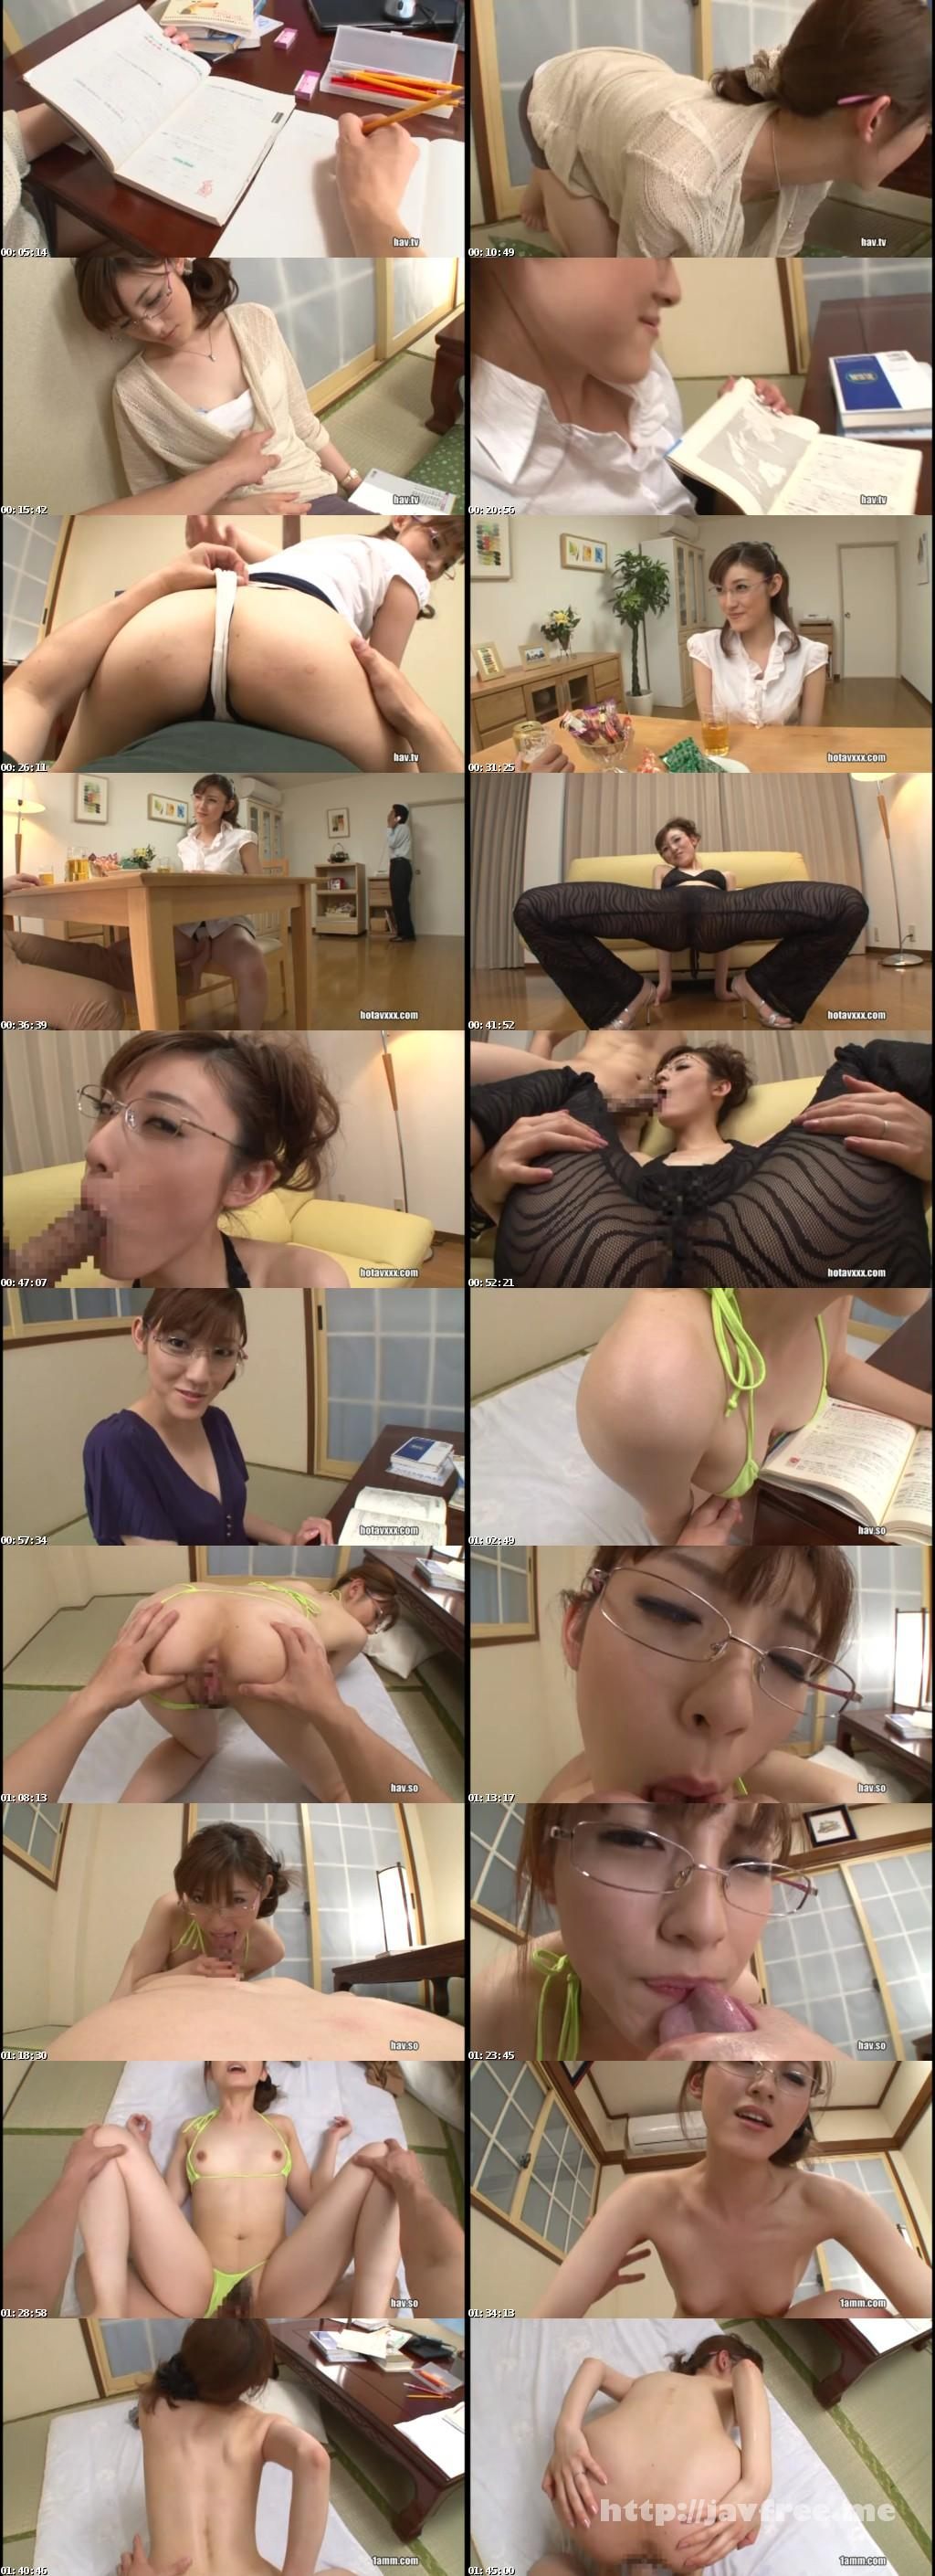 [VEMA-072] 友人の妻はドスケベ家庭教師 飯岡かなこ - image VEMA-072 on https://javfree.me